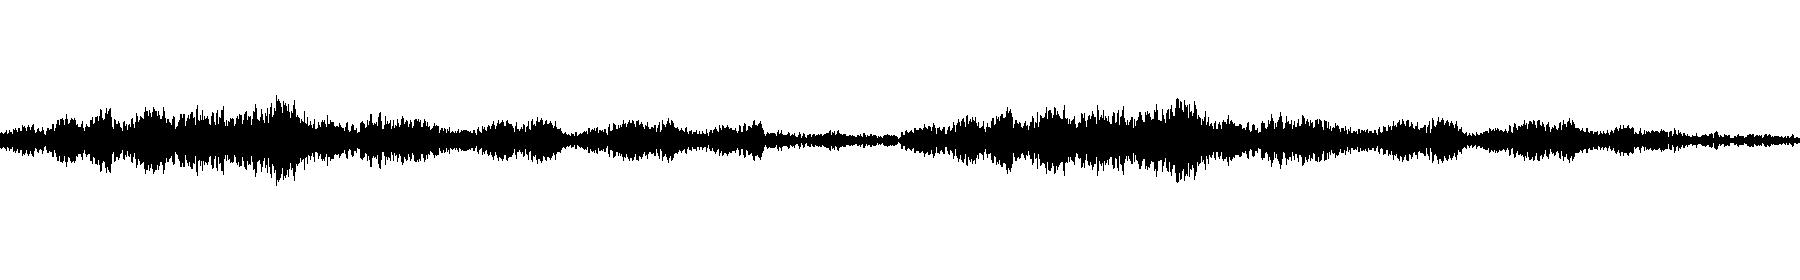 pth synth 03